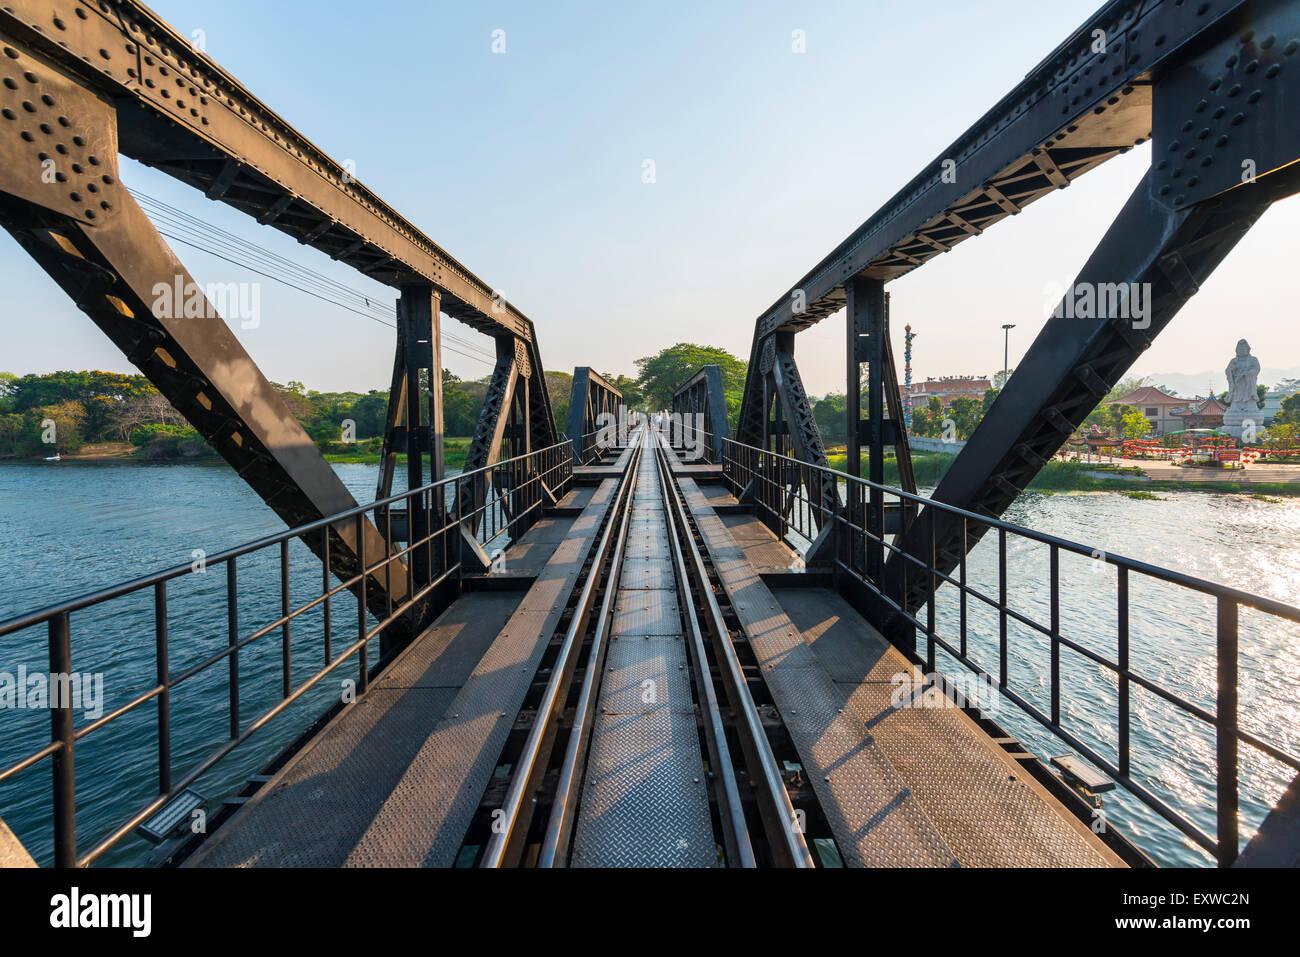 Historical River Kwai Bridge, route of the Thailand-Burma Railway, Death Railway, Kanchanaburi Province, Central - Stock Image